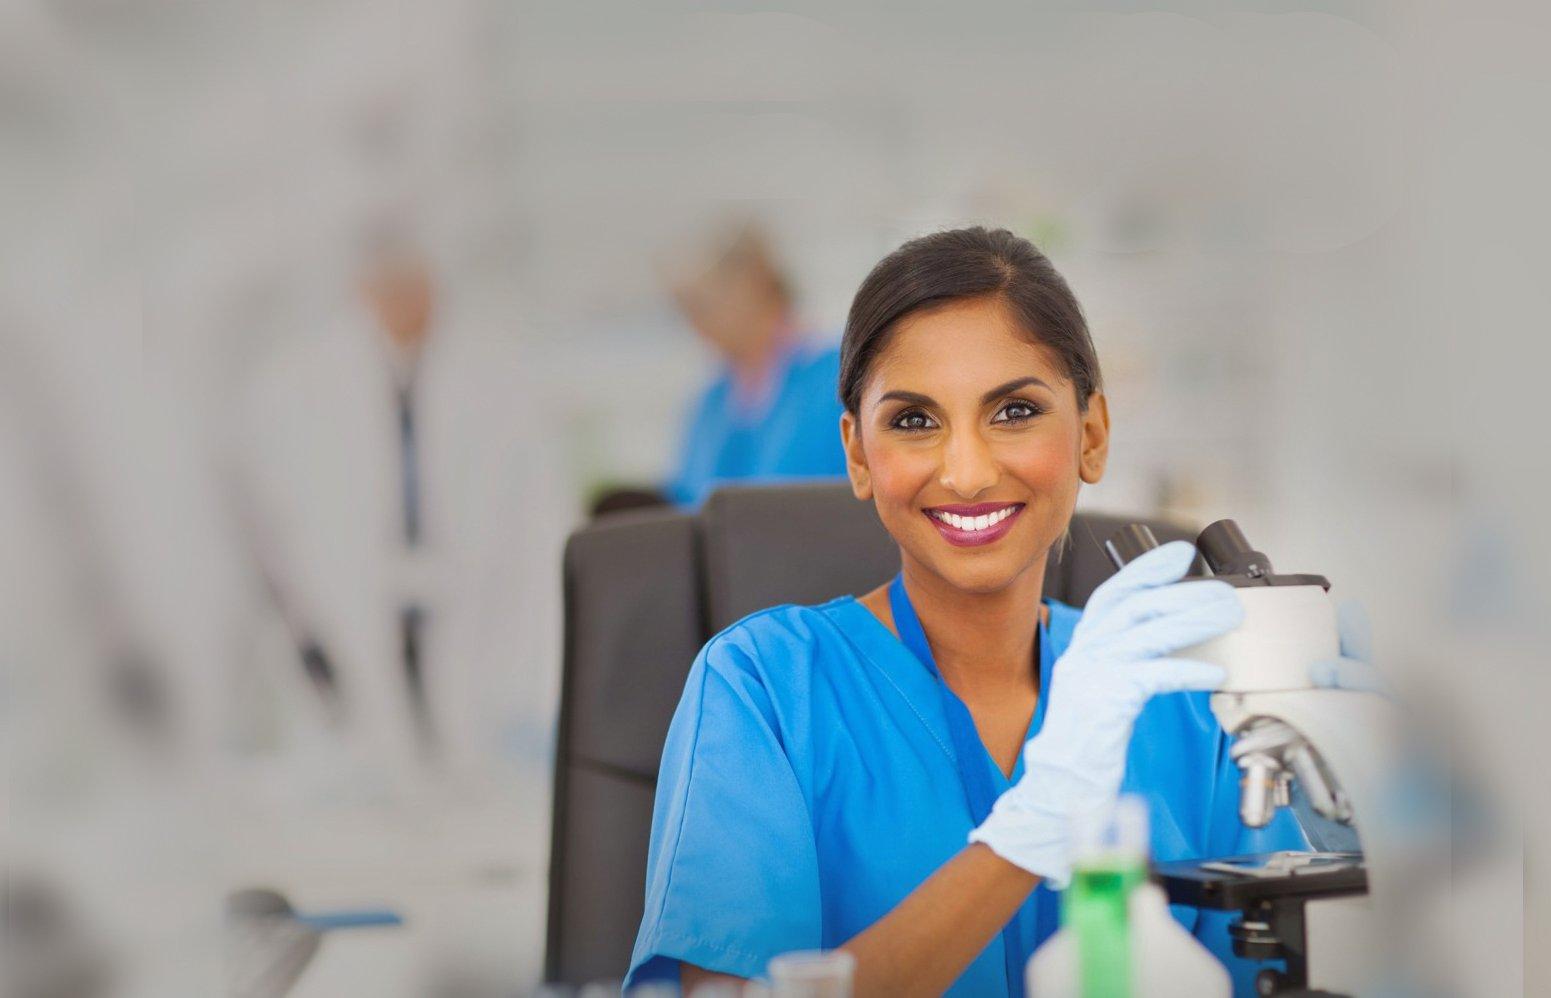 Medical Laboratory Technician Anderson College Greater Toronto